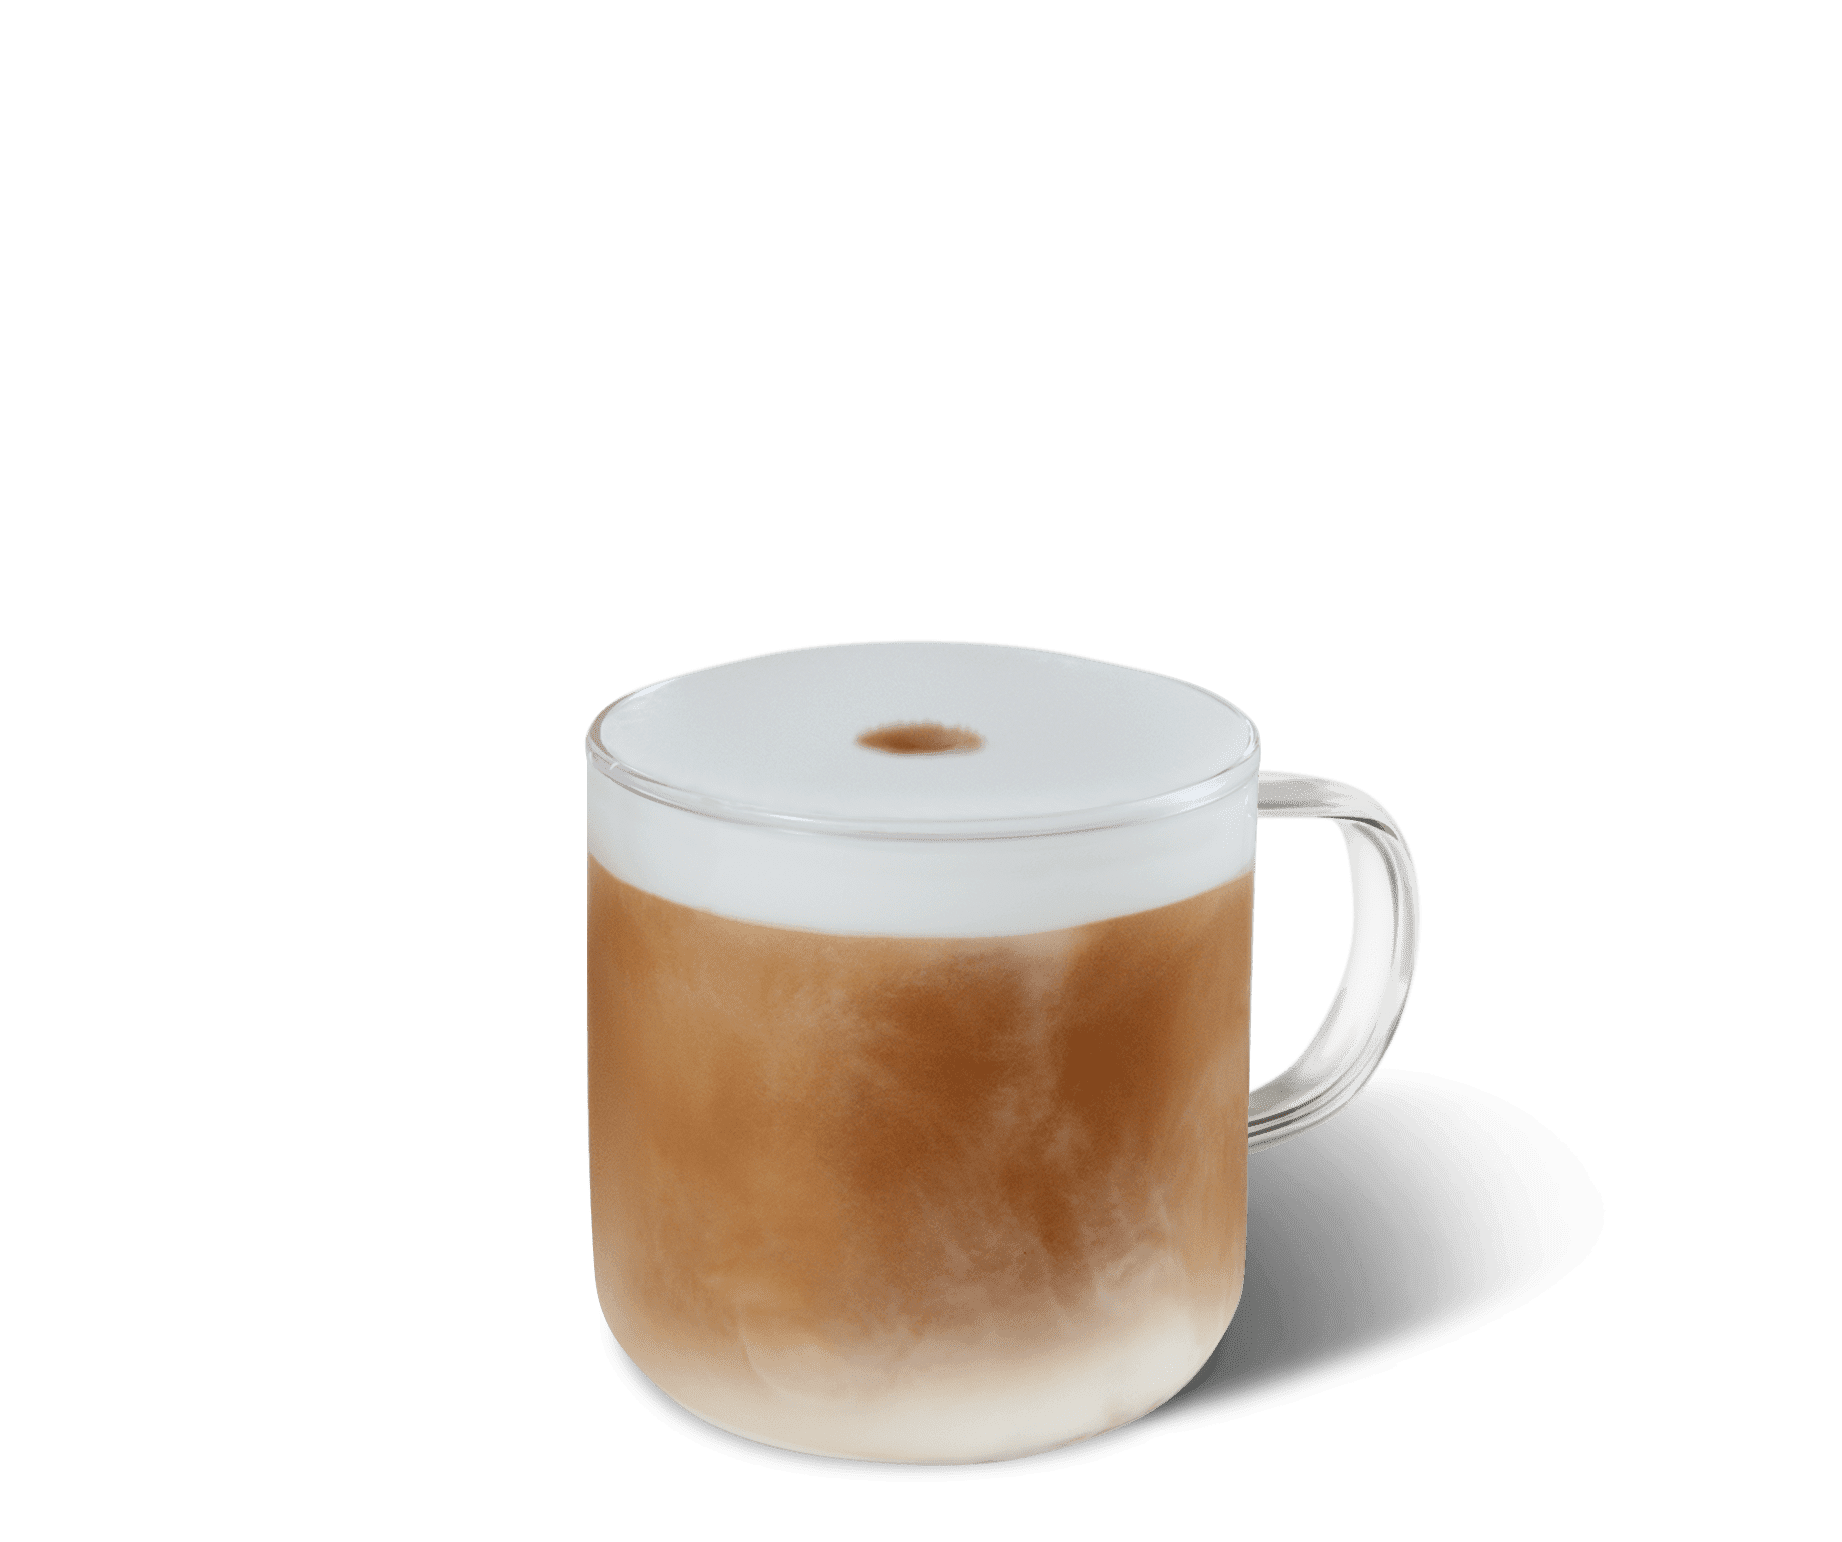 Tazza di latte macchiato Starbucks Veranda Blend Caffè Macinato